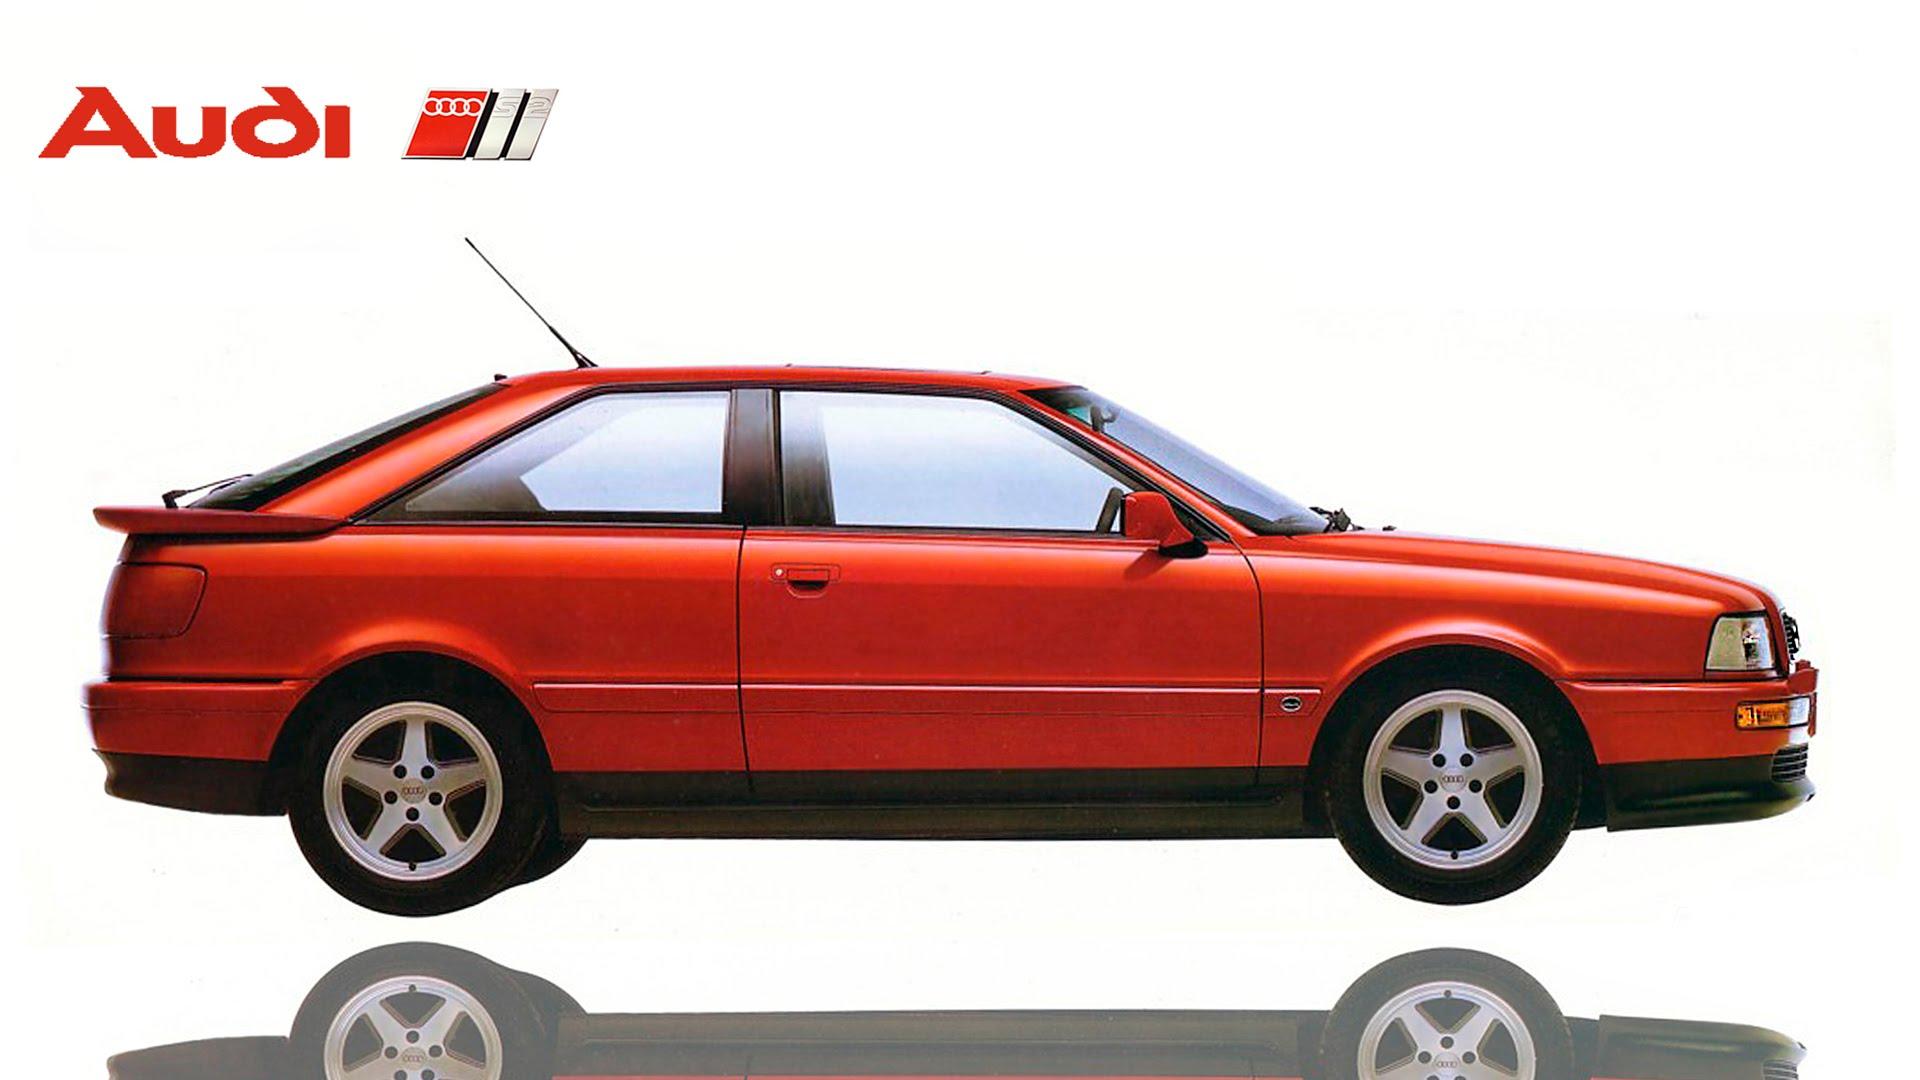 Audi S2 I 1990 - 1995 Coupe #5